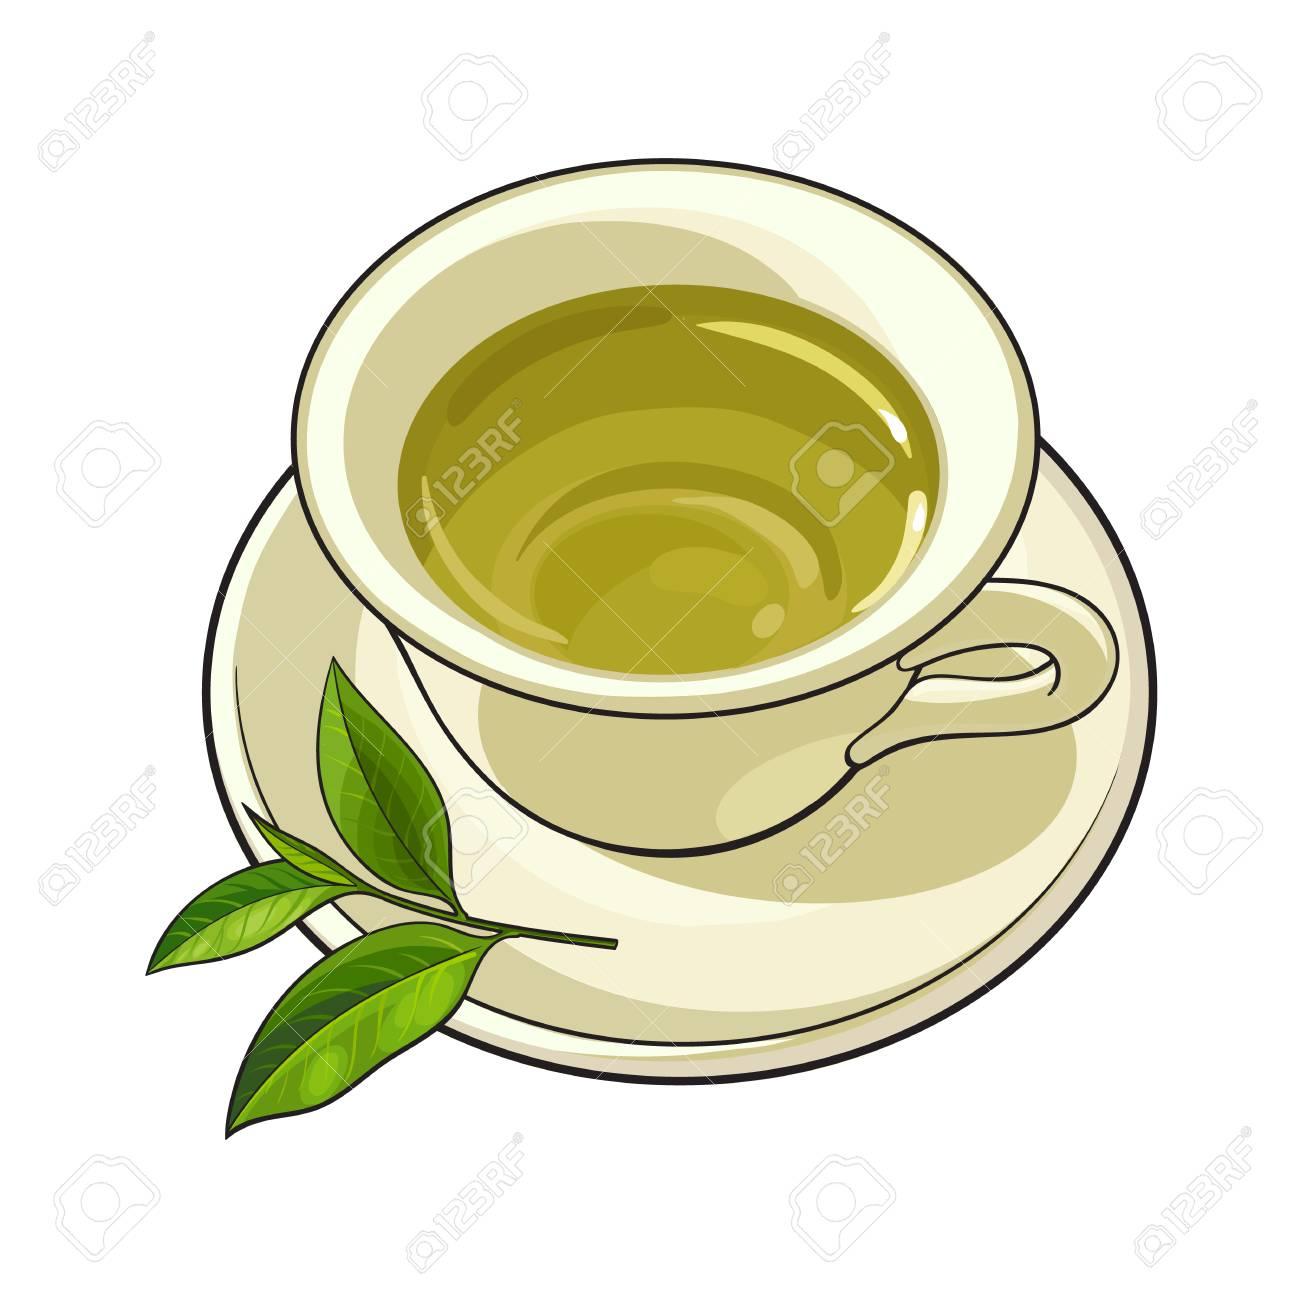 China, porcelain cup, saucer and fresh green tea leaf, sketch...